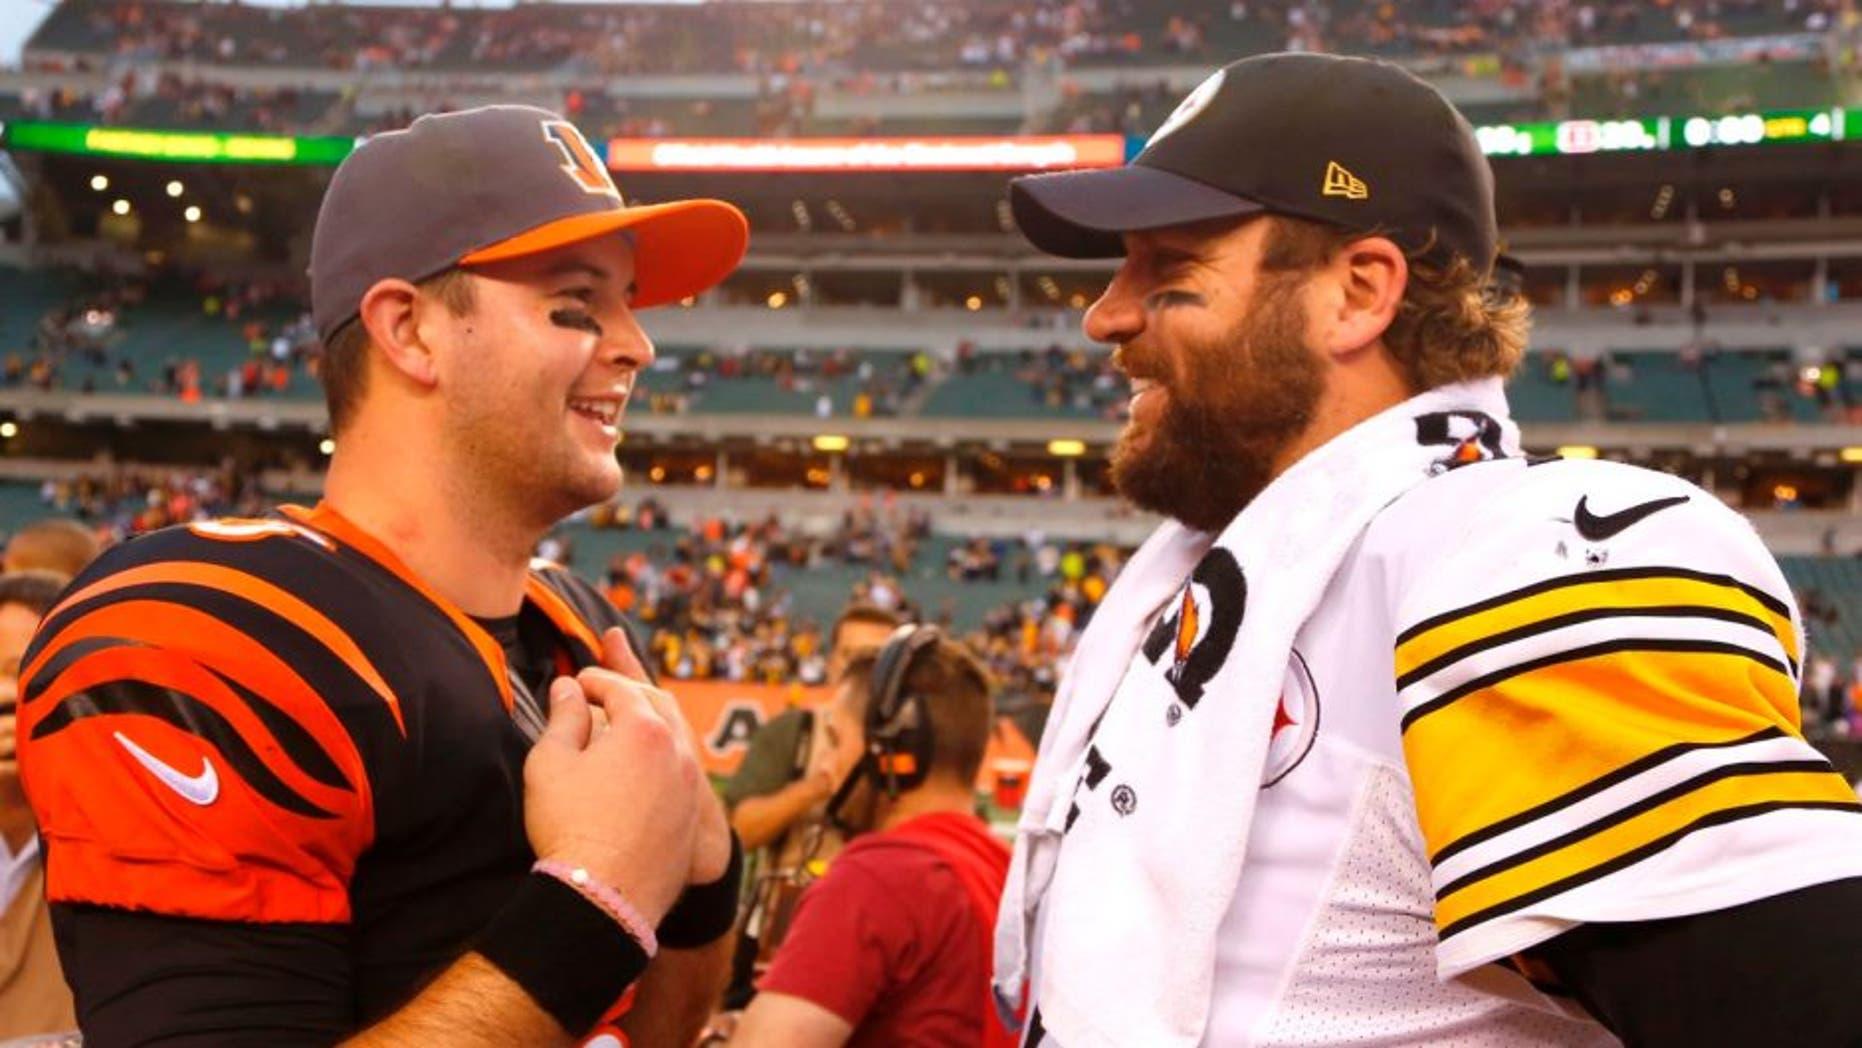 Dec 13, 2015; Cincinnati, OH, USA; Pittsburgh Steelers quarterback Ben Roethlisberger (R) talks with Cincinnati Bengals quarterback AJ McCarron (L) after the Steelers beat the Bengals 33-20 at Paul Brown Stadium. Mandatory Credit: David Kohl-USA TODAY Sports